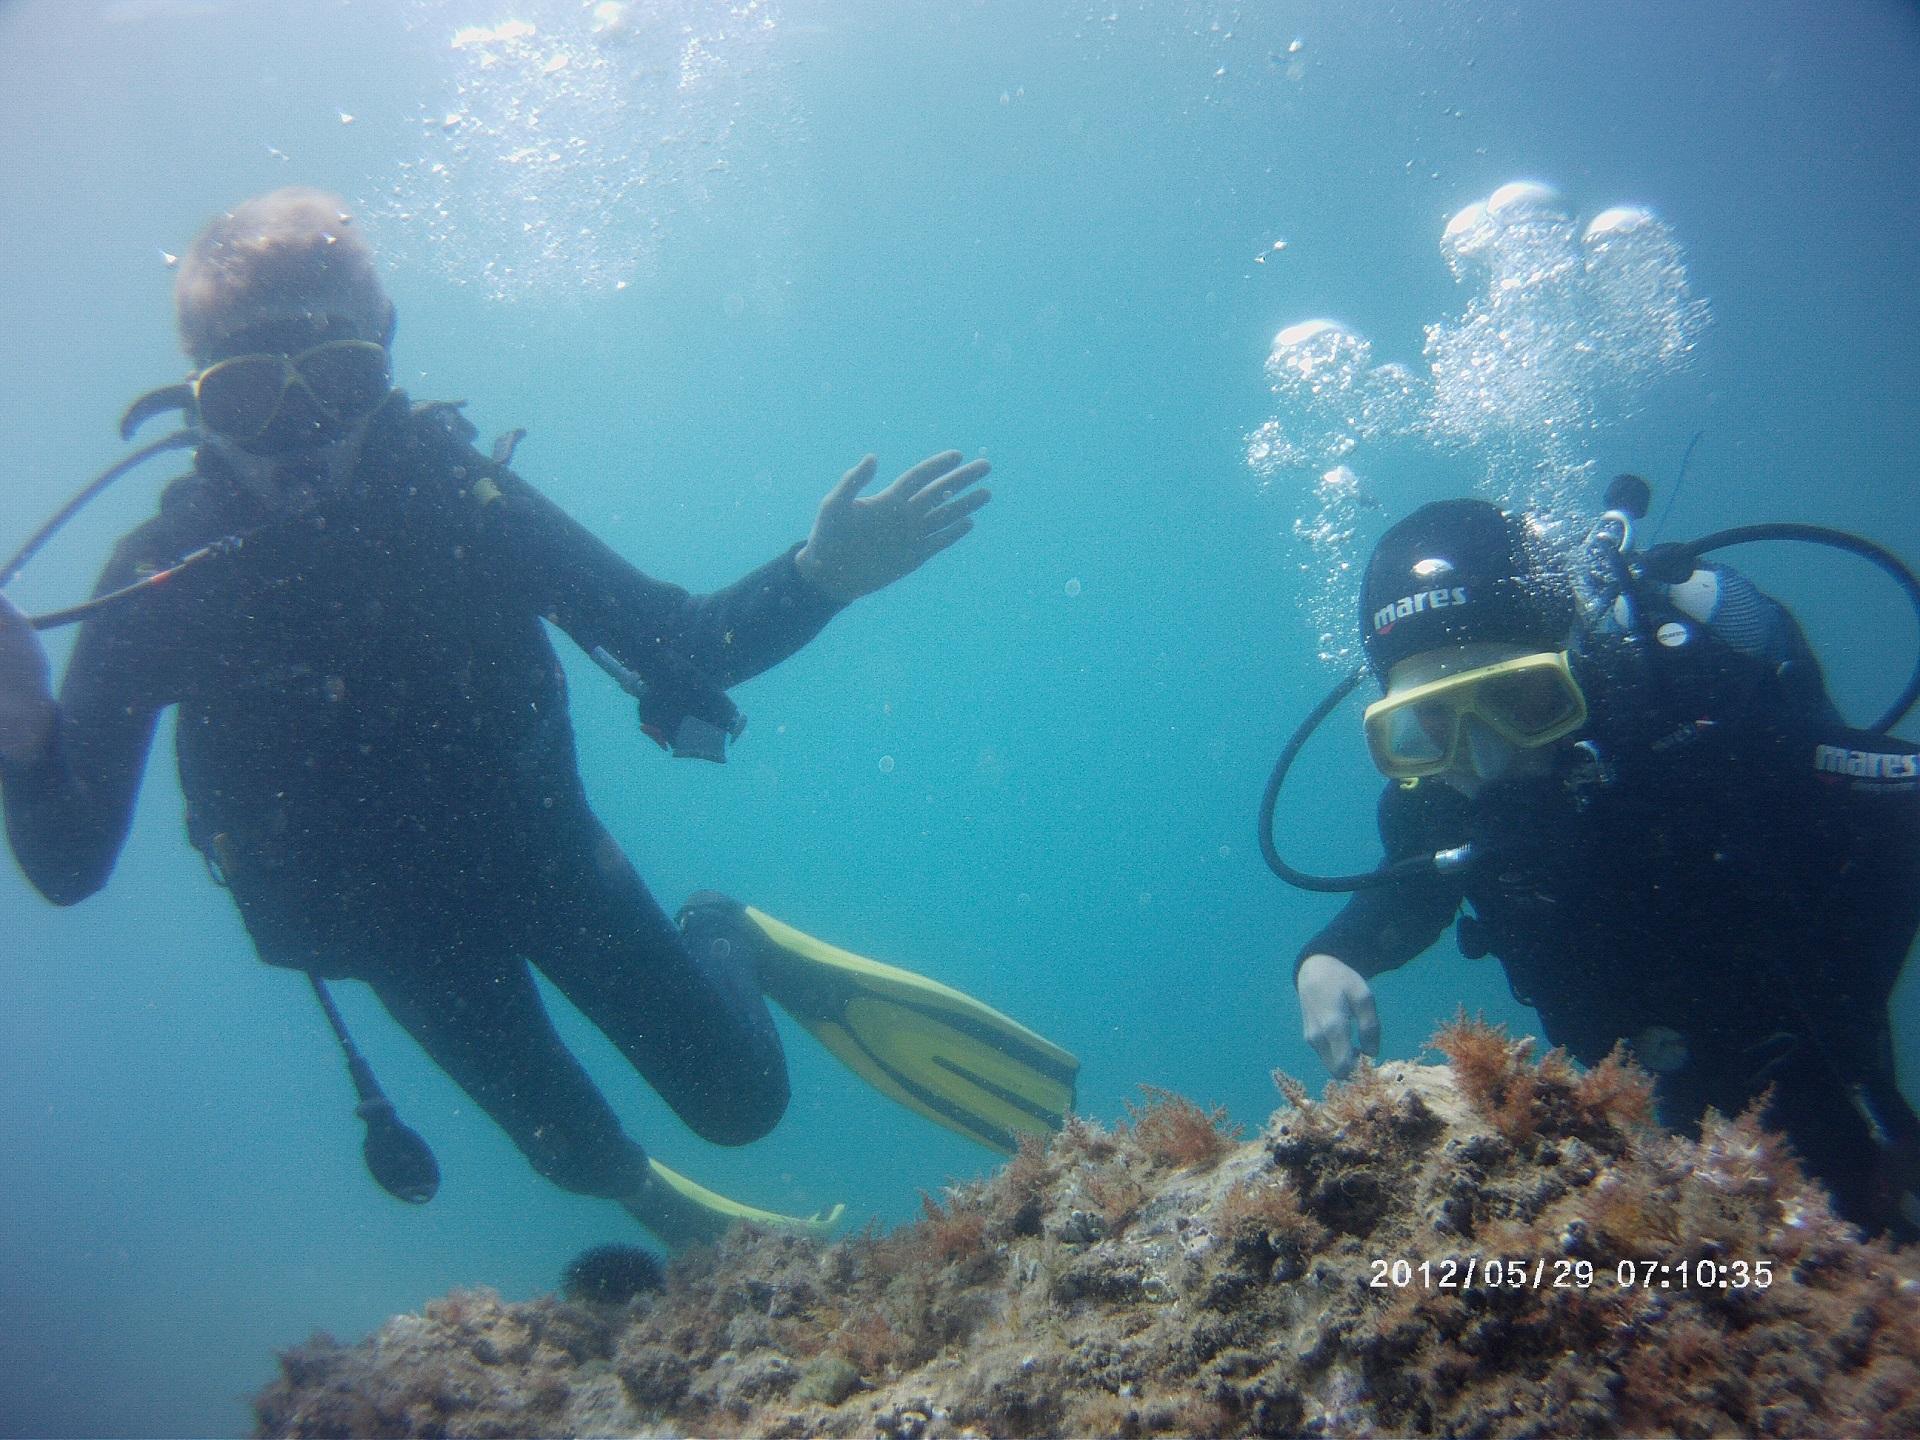 © lagune plongee